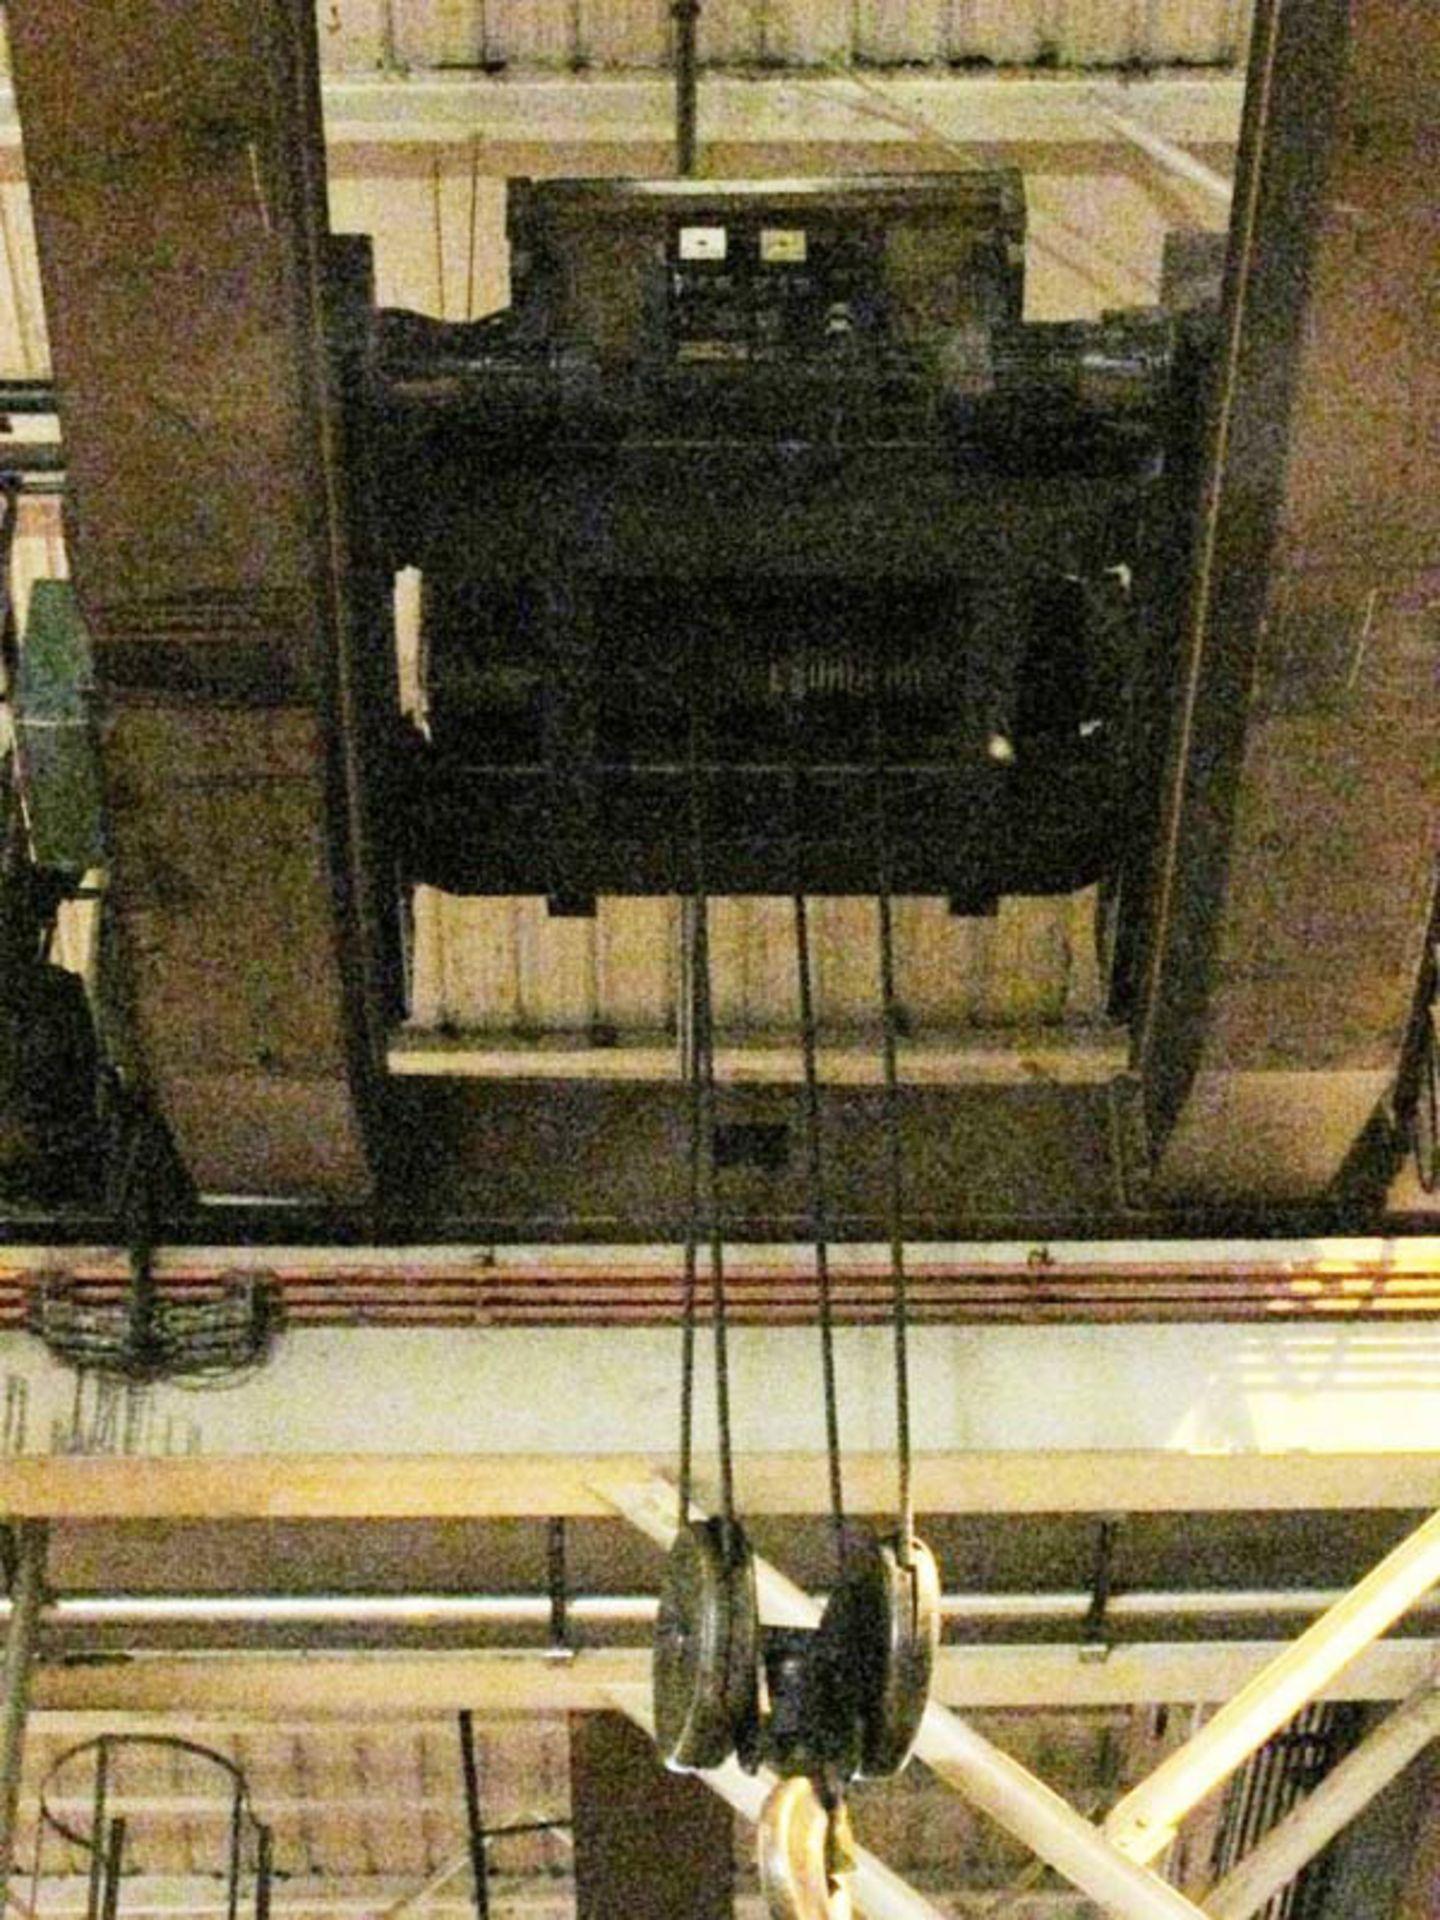 Demag Top Riding Double Girder Bridge Crane | 25-Ton x 50', Mdl: N/A, S/N: 75066 - 8398P - Image 5 of 10